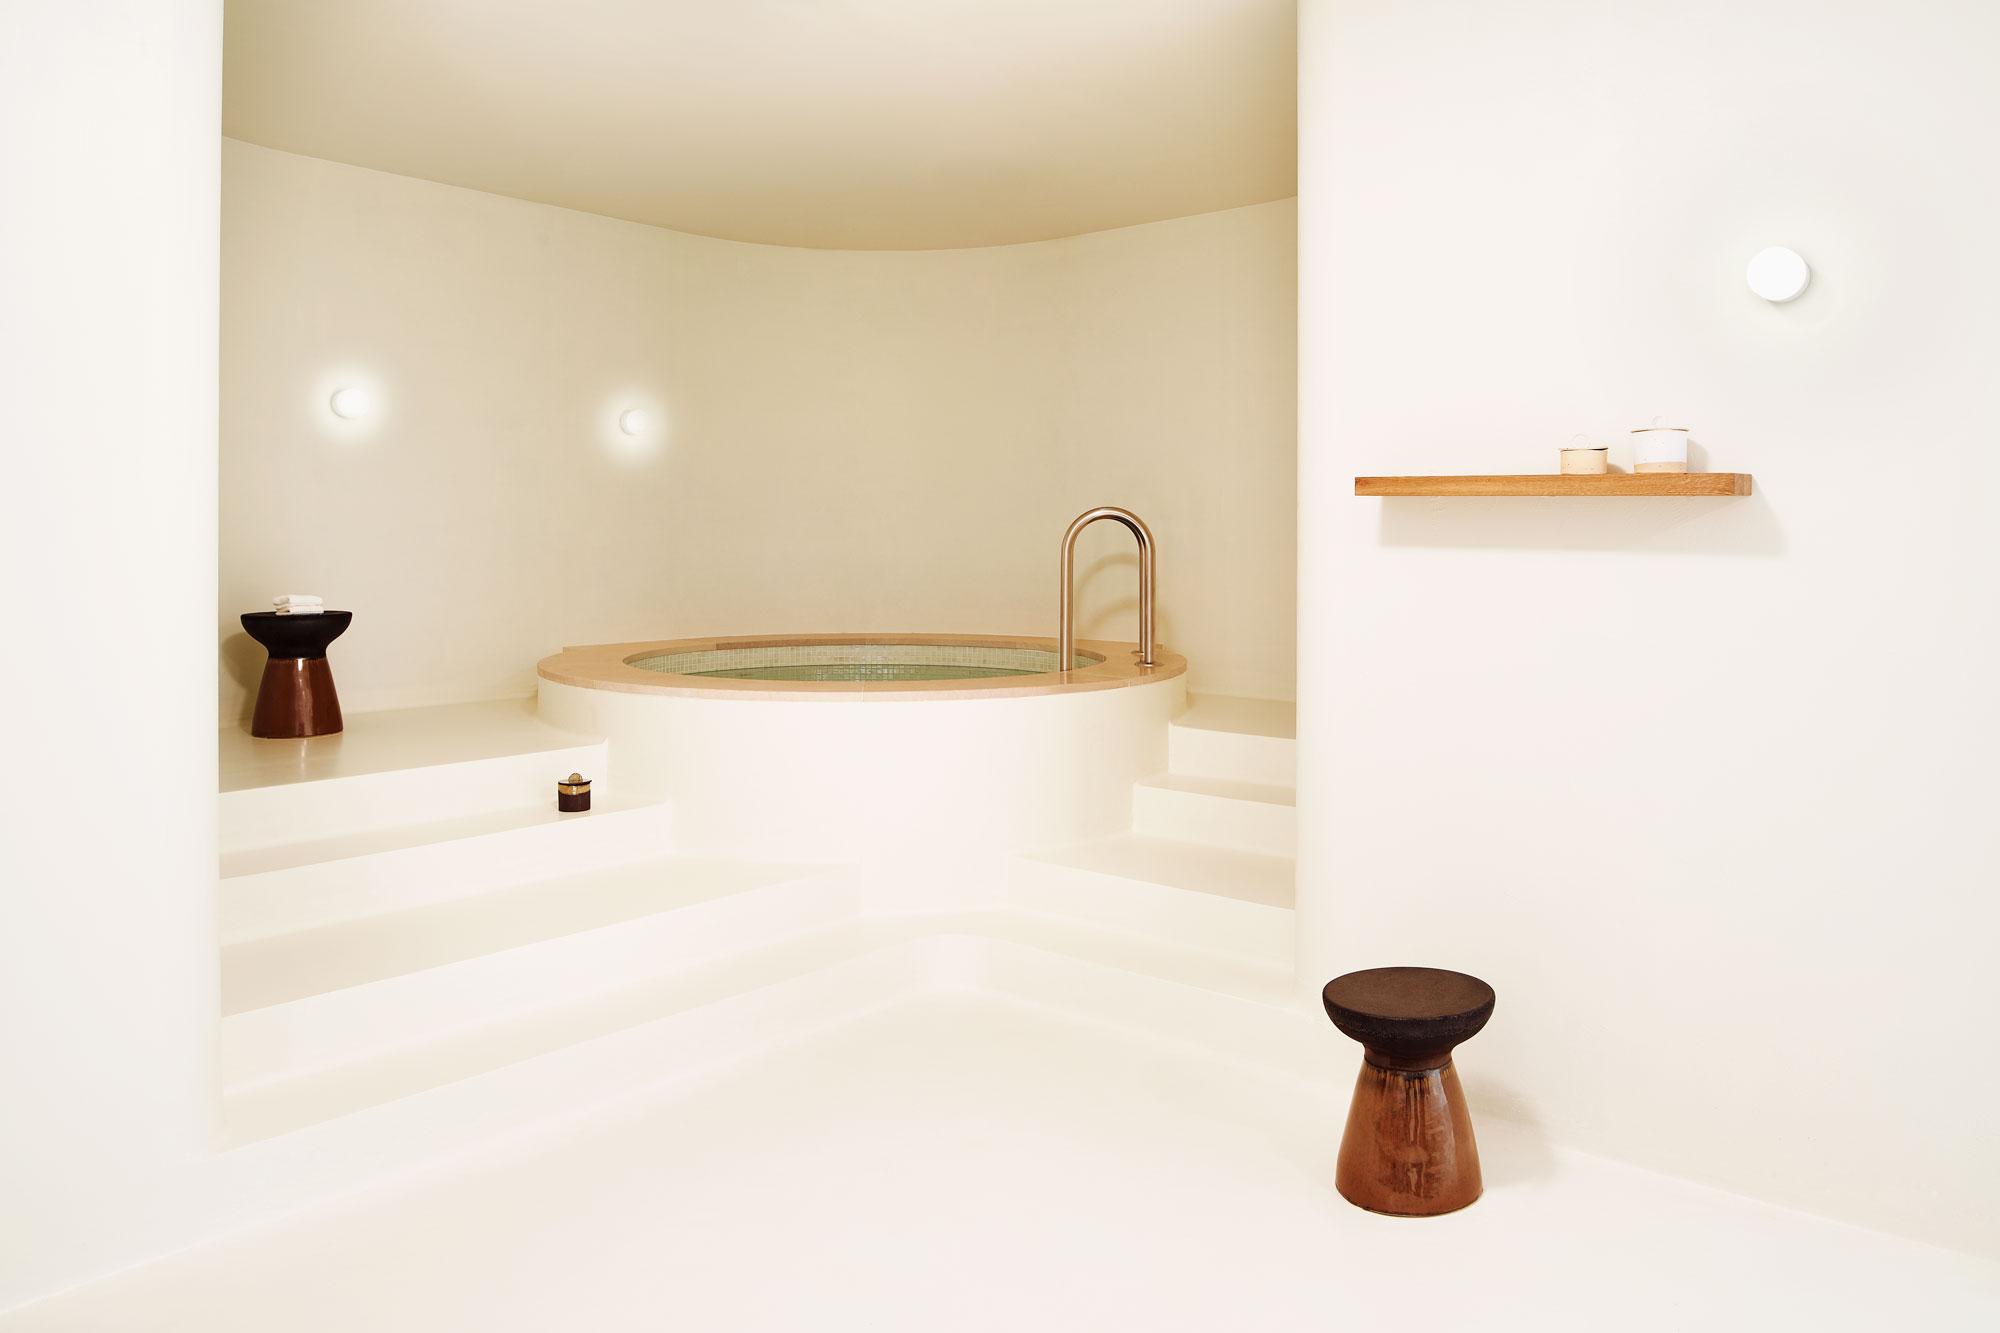 Lam Studio Hotel Maslina Hvar Croatia Luxury Accommodatino Photo Claire Israel Yellowtrace 08